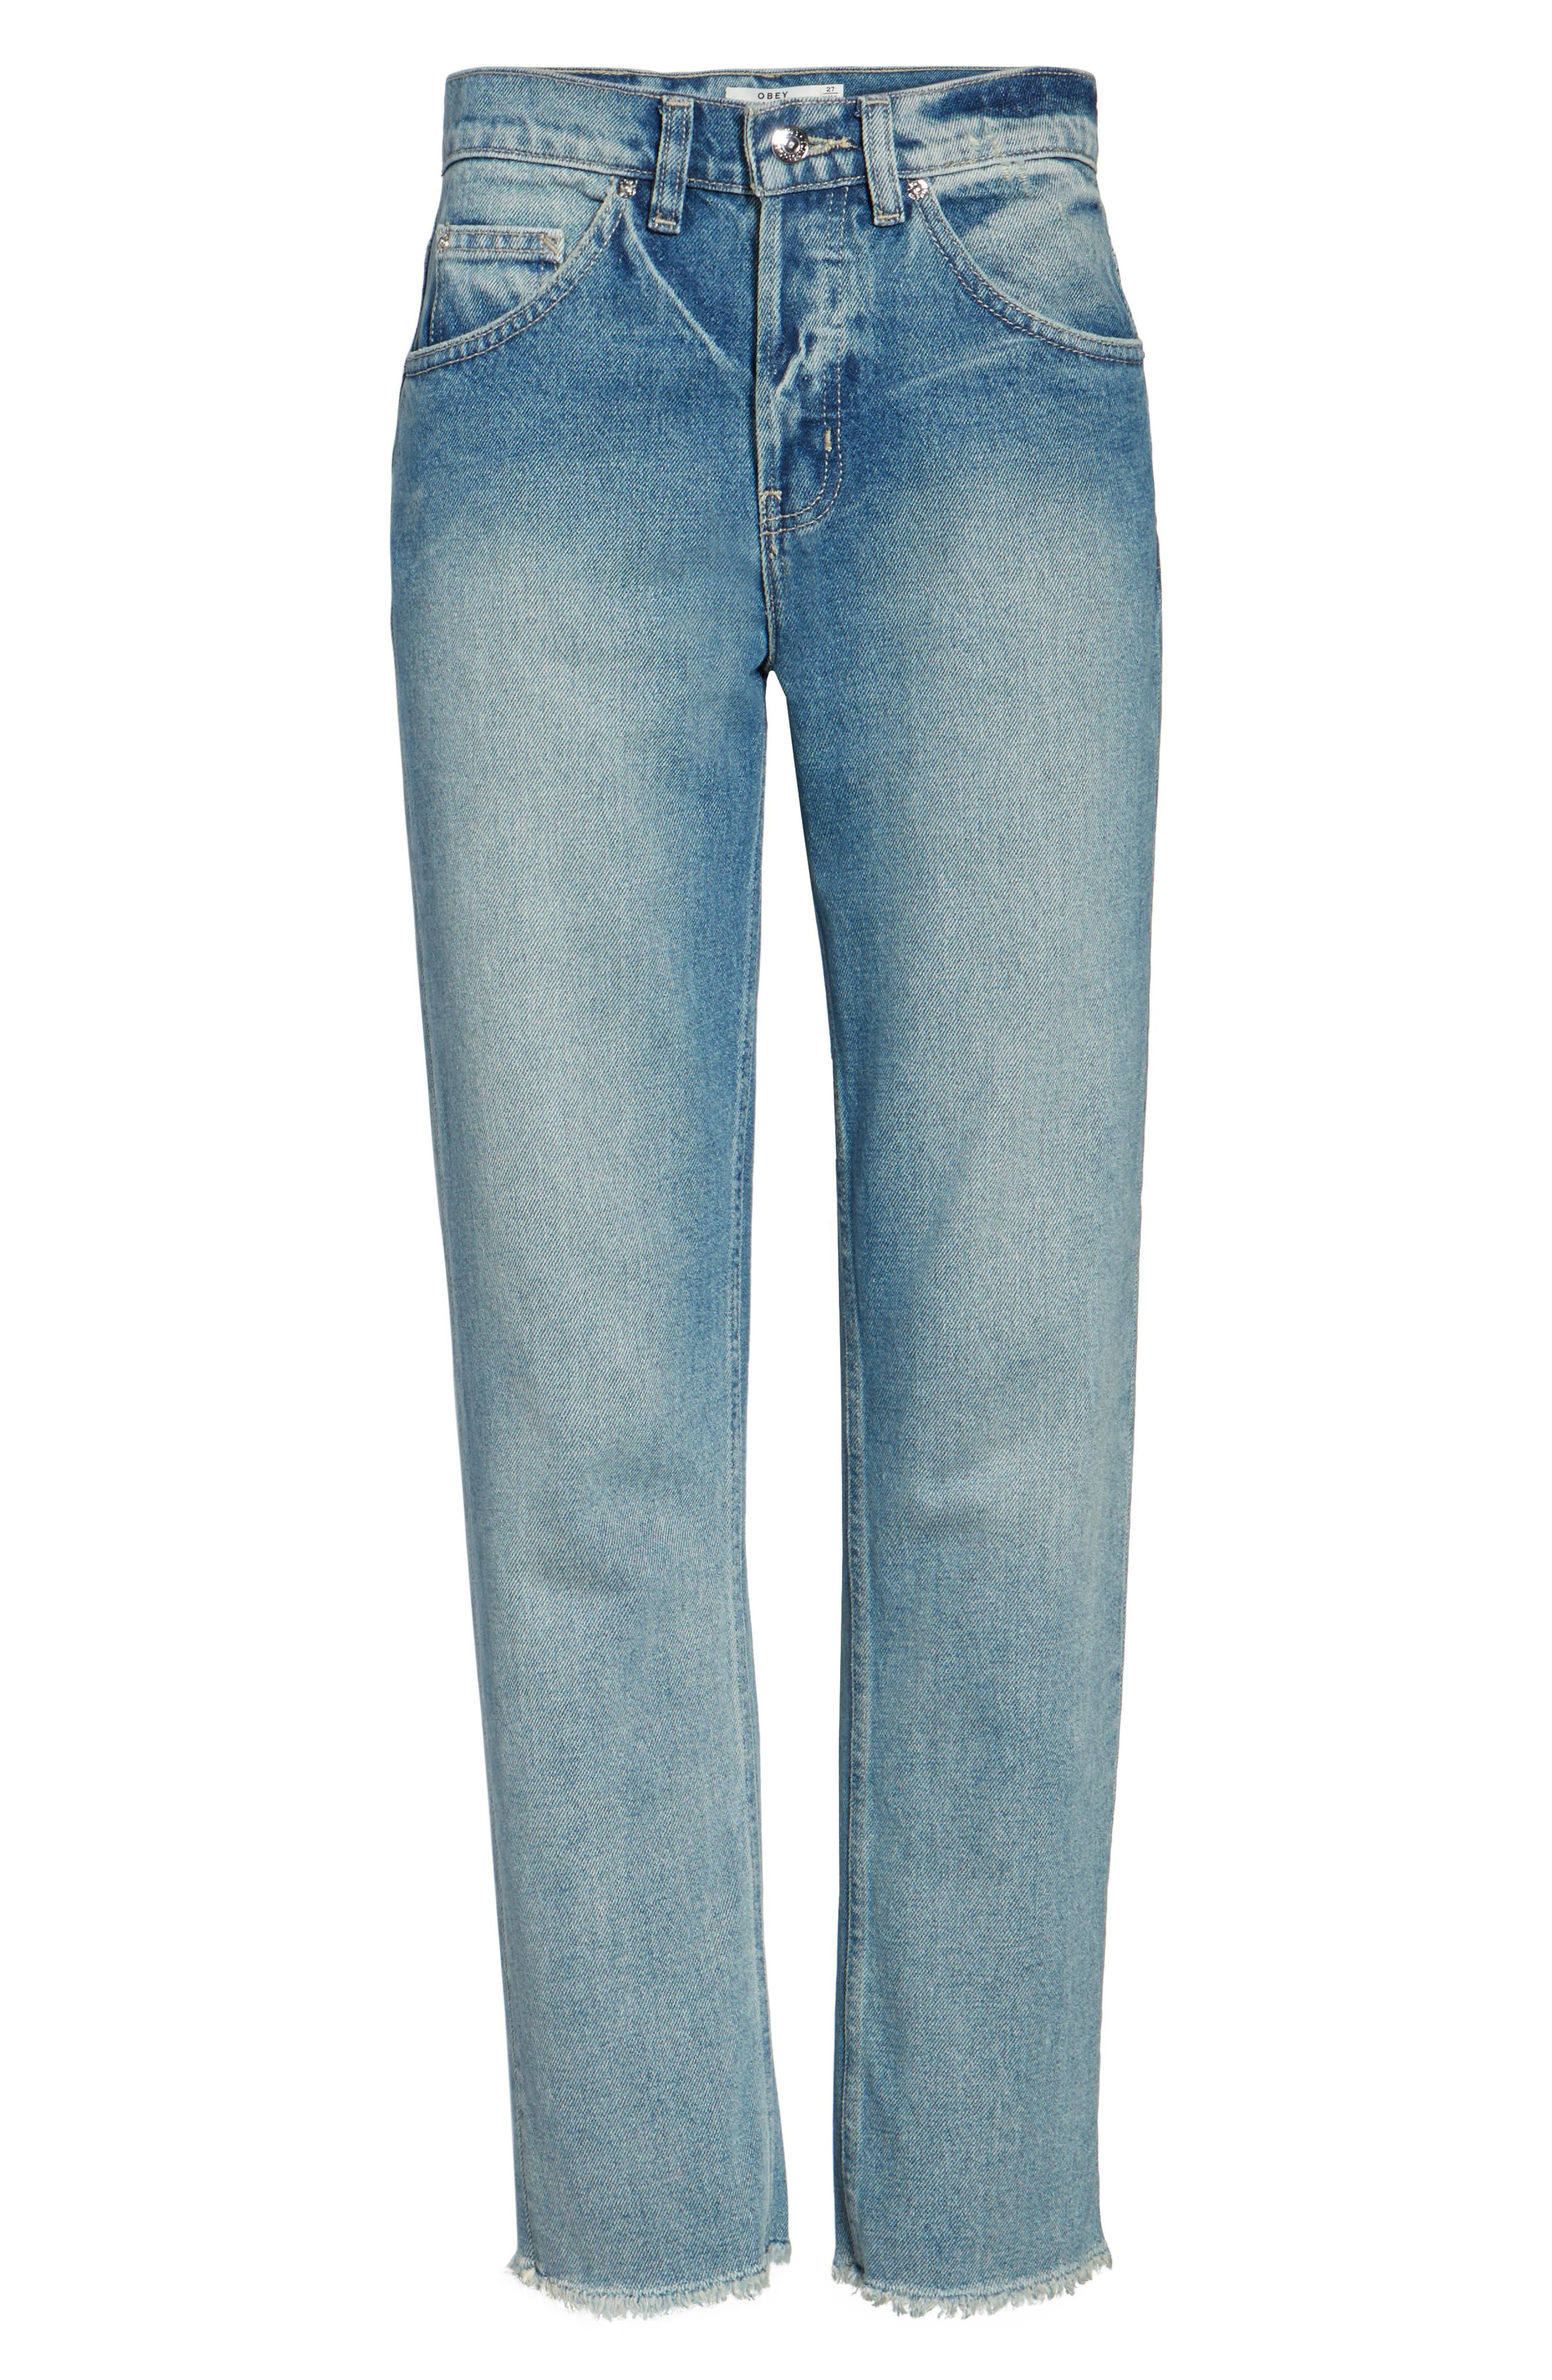 Sundays Straggler High Waist Jeans,                             Alternate thumbnail 6, color,